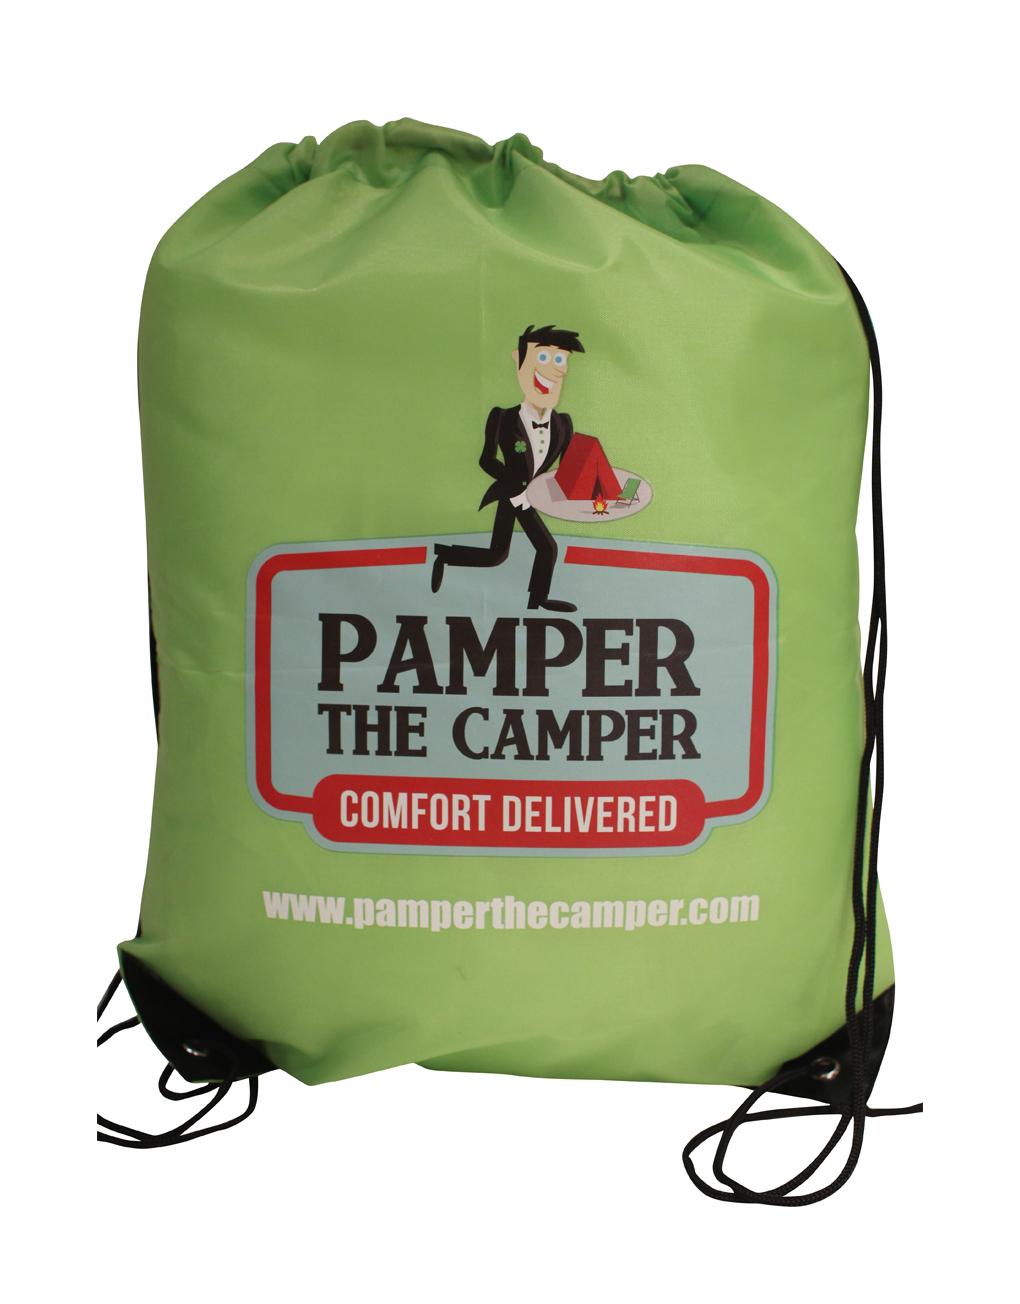 Ladies Pamper Pack Pamper The Camper One Stop Shop For